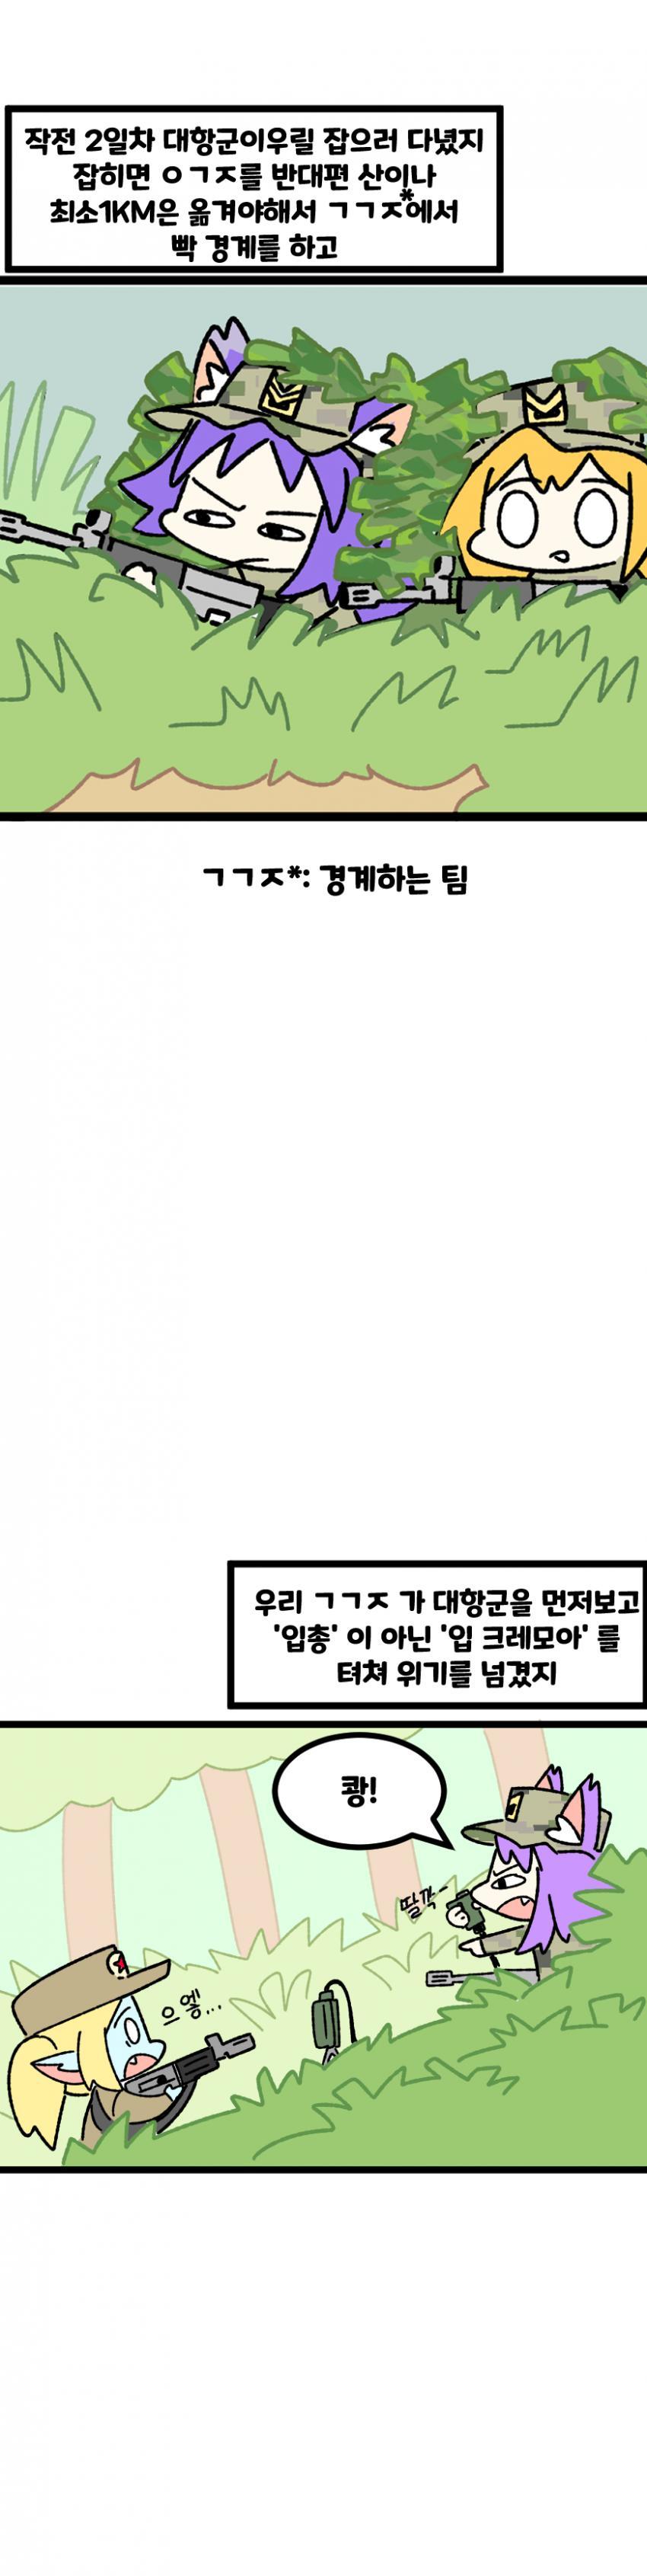 viewimage.php?id=2ebcc232eadd36&no=24b0d769e1d32ca73fec8efa11d02831835273132ddd61d36cf617d09f43d54cff8b7278954ea96a93bf9ab3dcb07cadf07e8de445e454a44120689f06ee3ce3c4